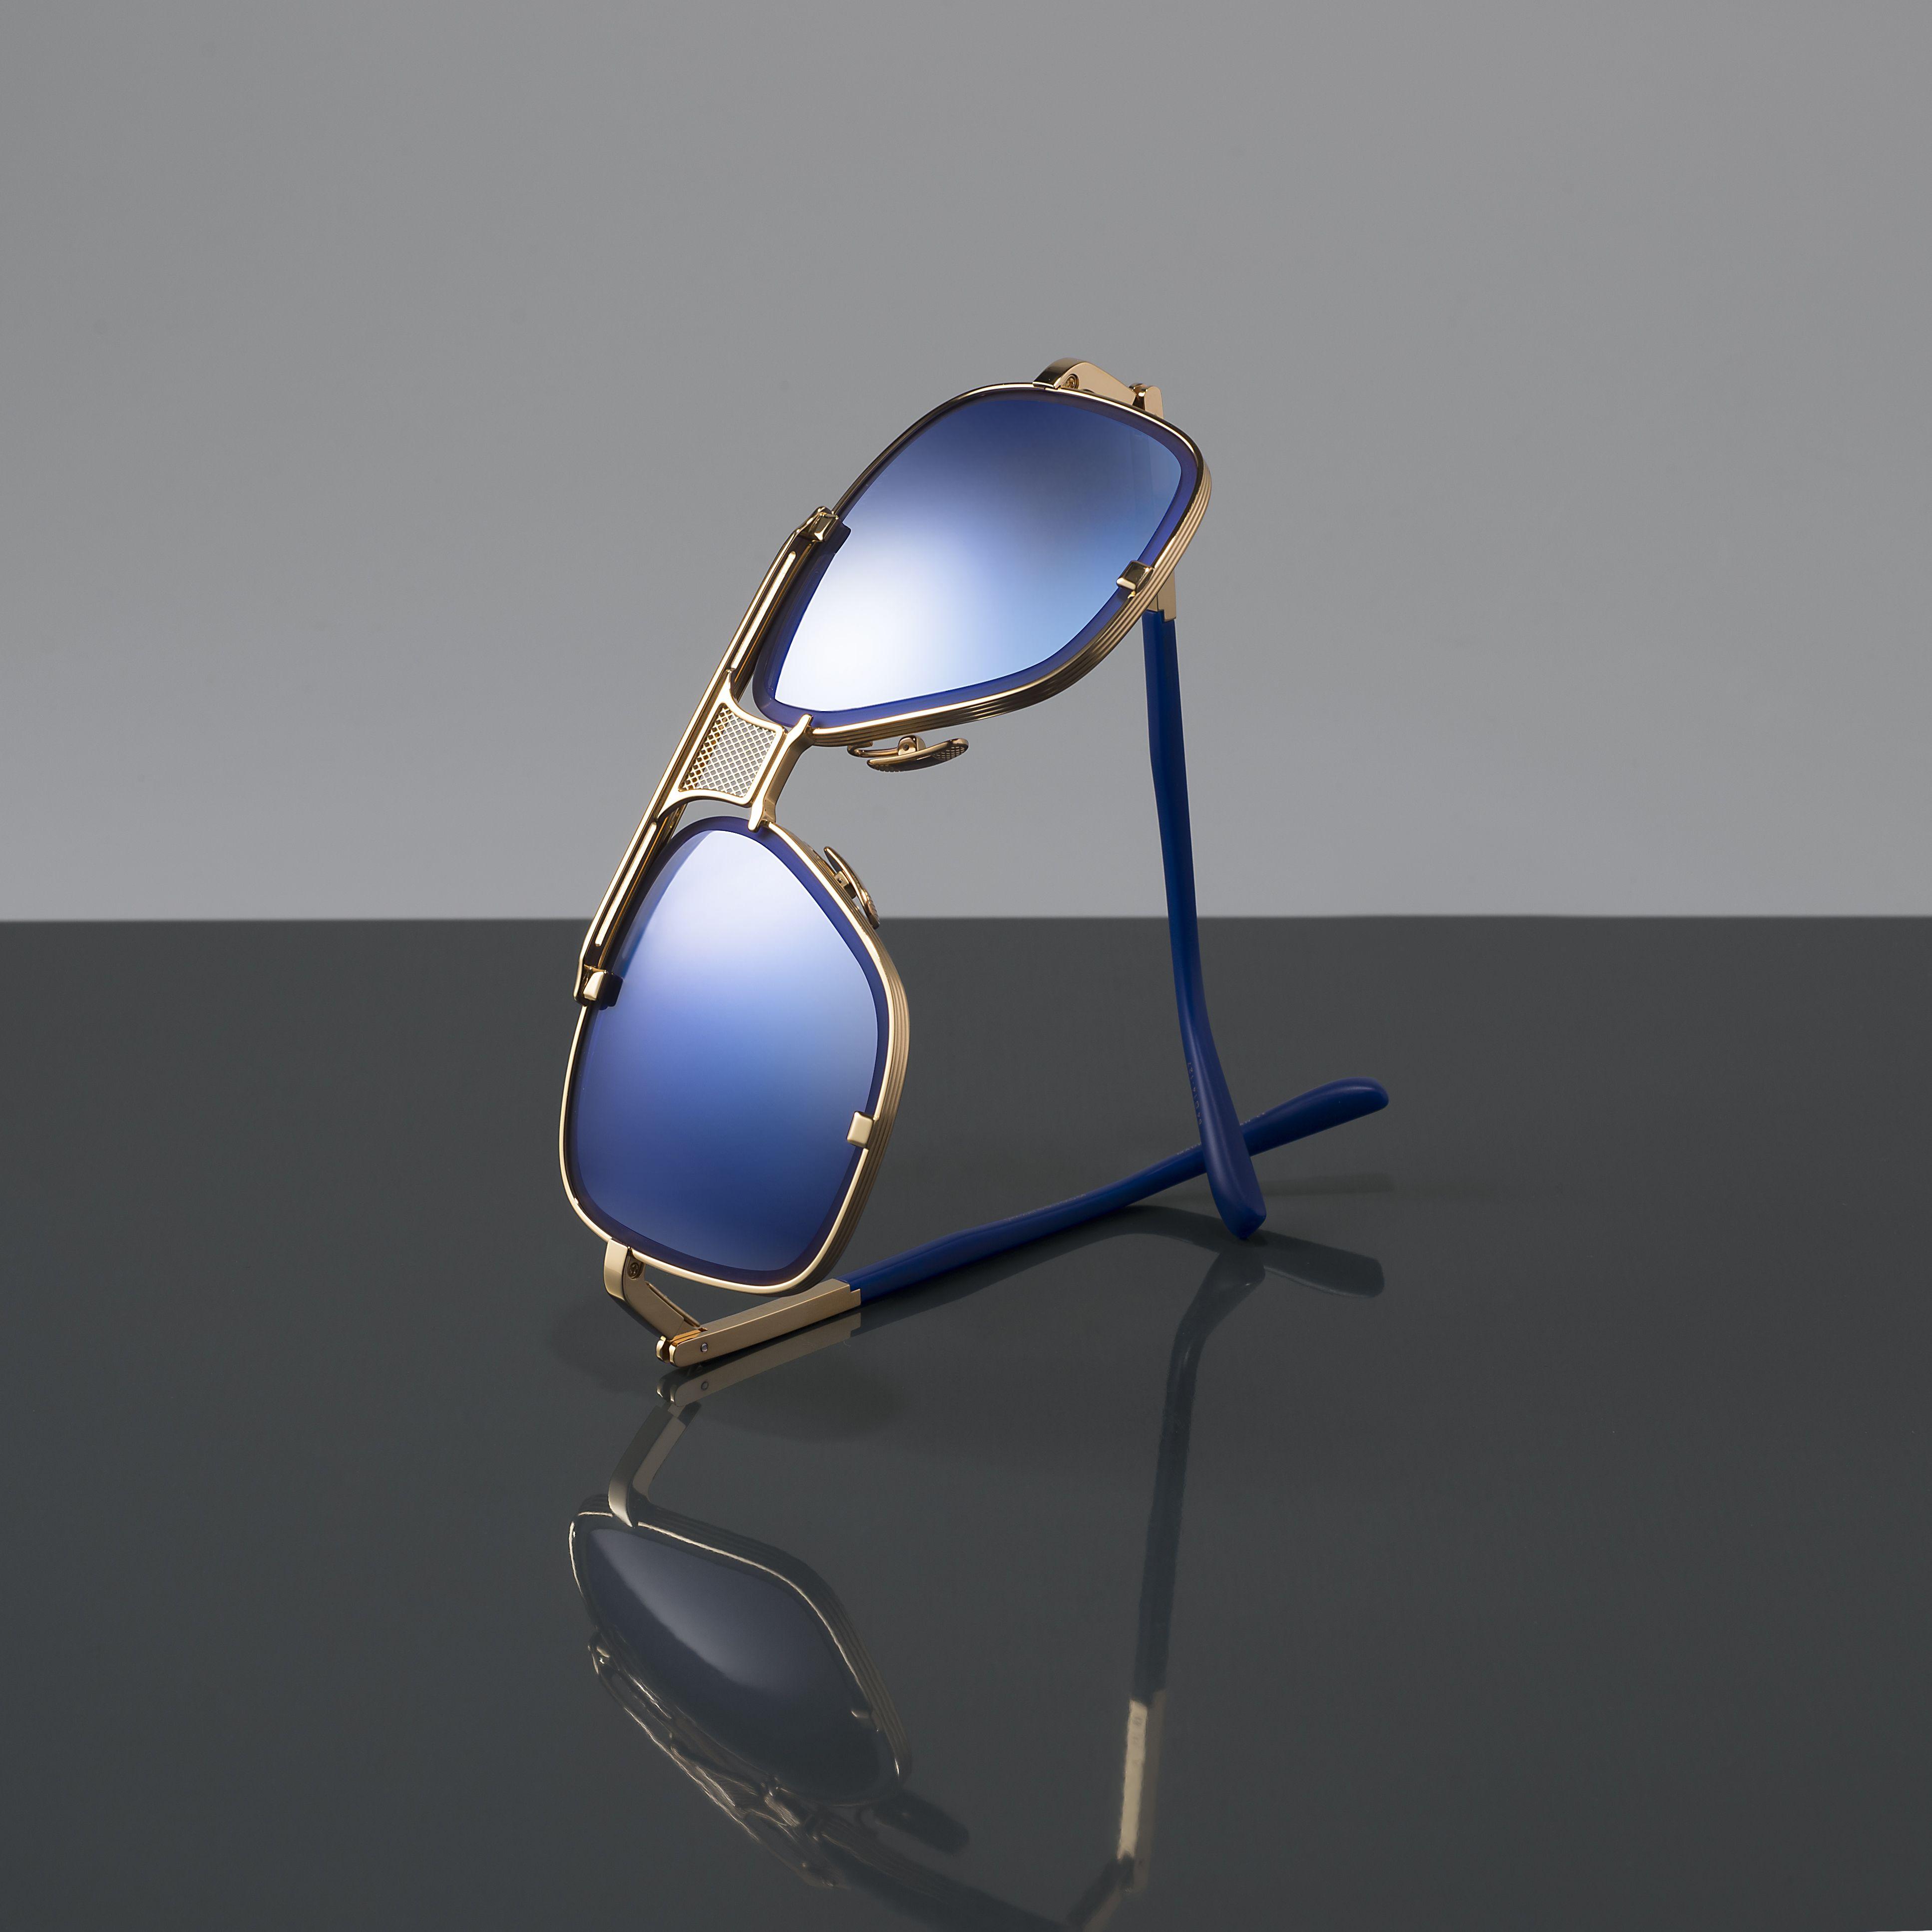 0311ed29f19 Blue and Gold    The Mach-Five aviator sunglasses by DITA Eyewear ...